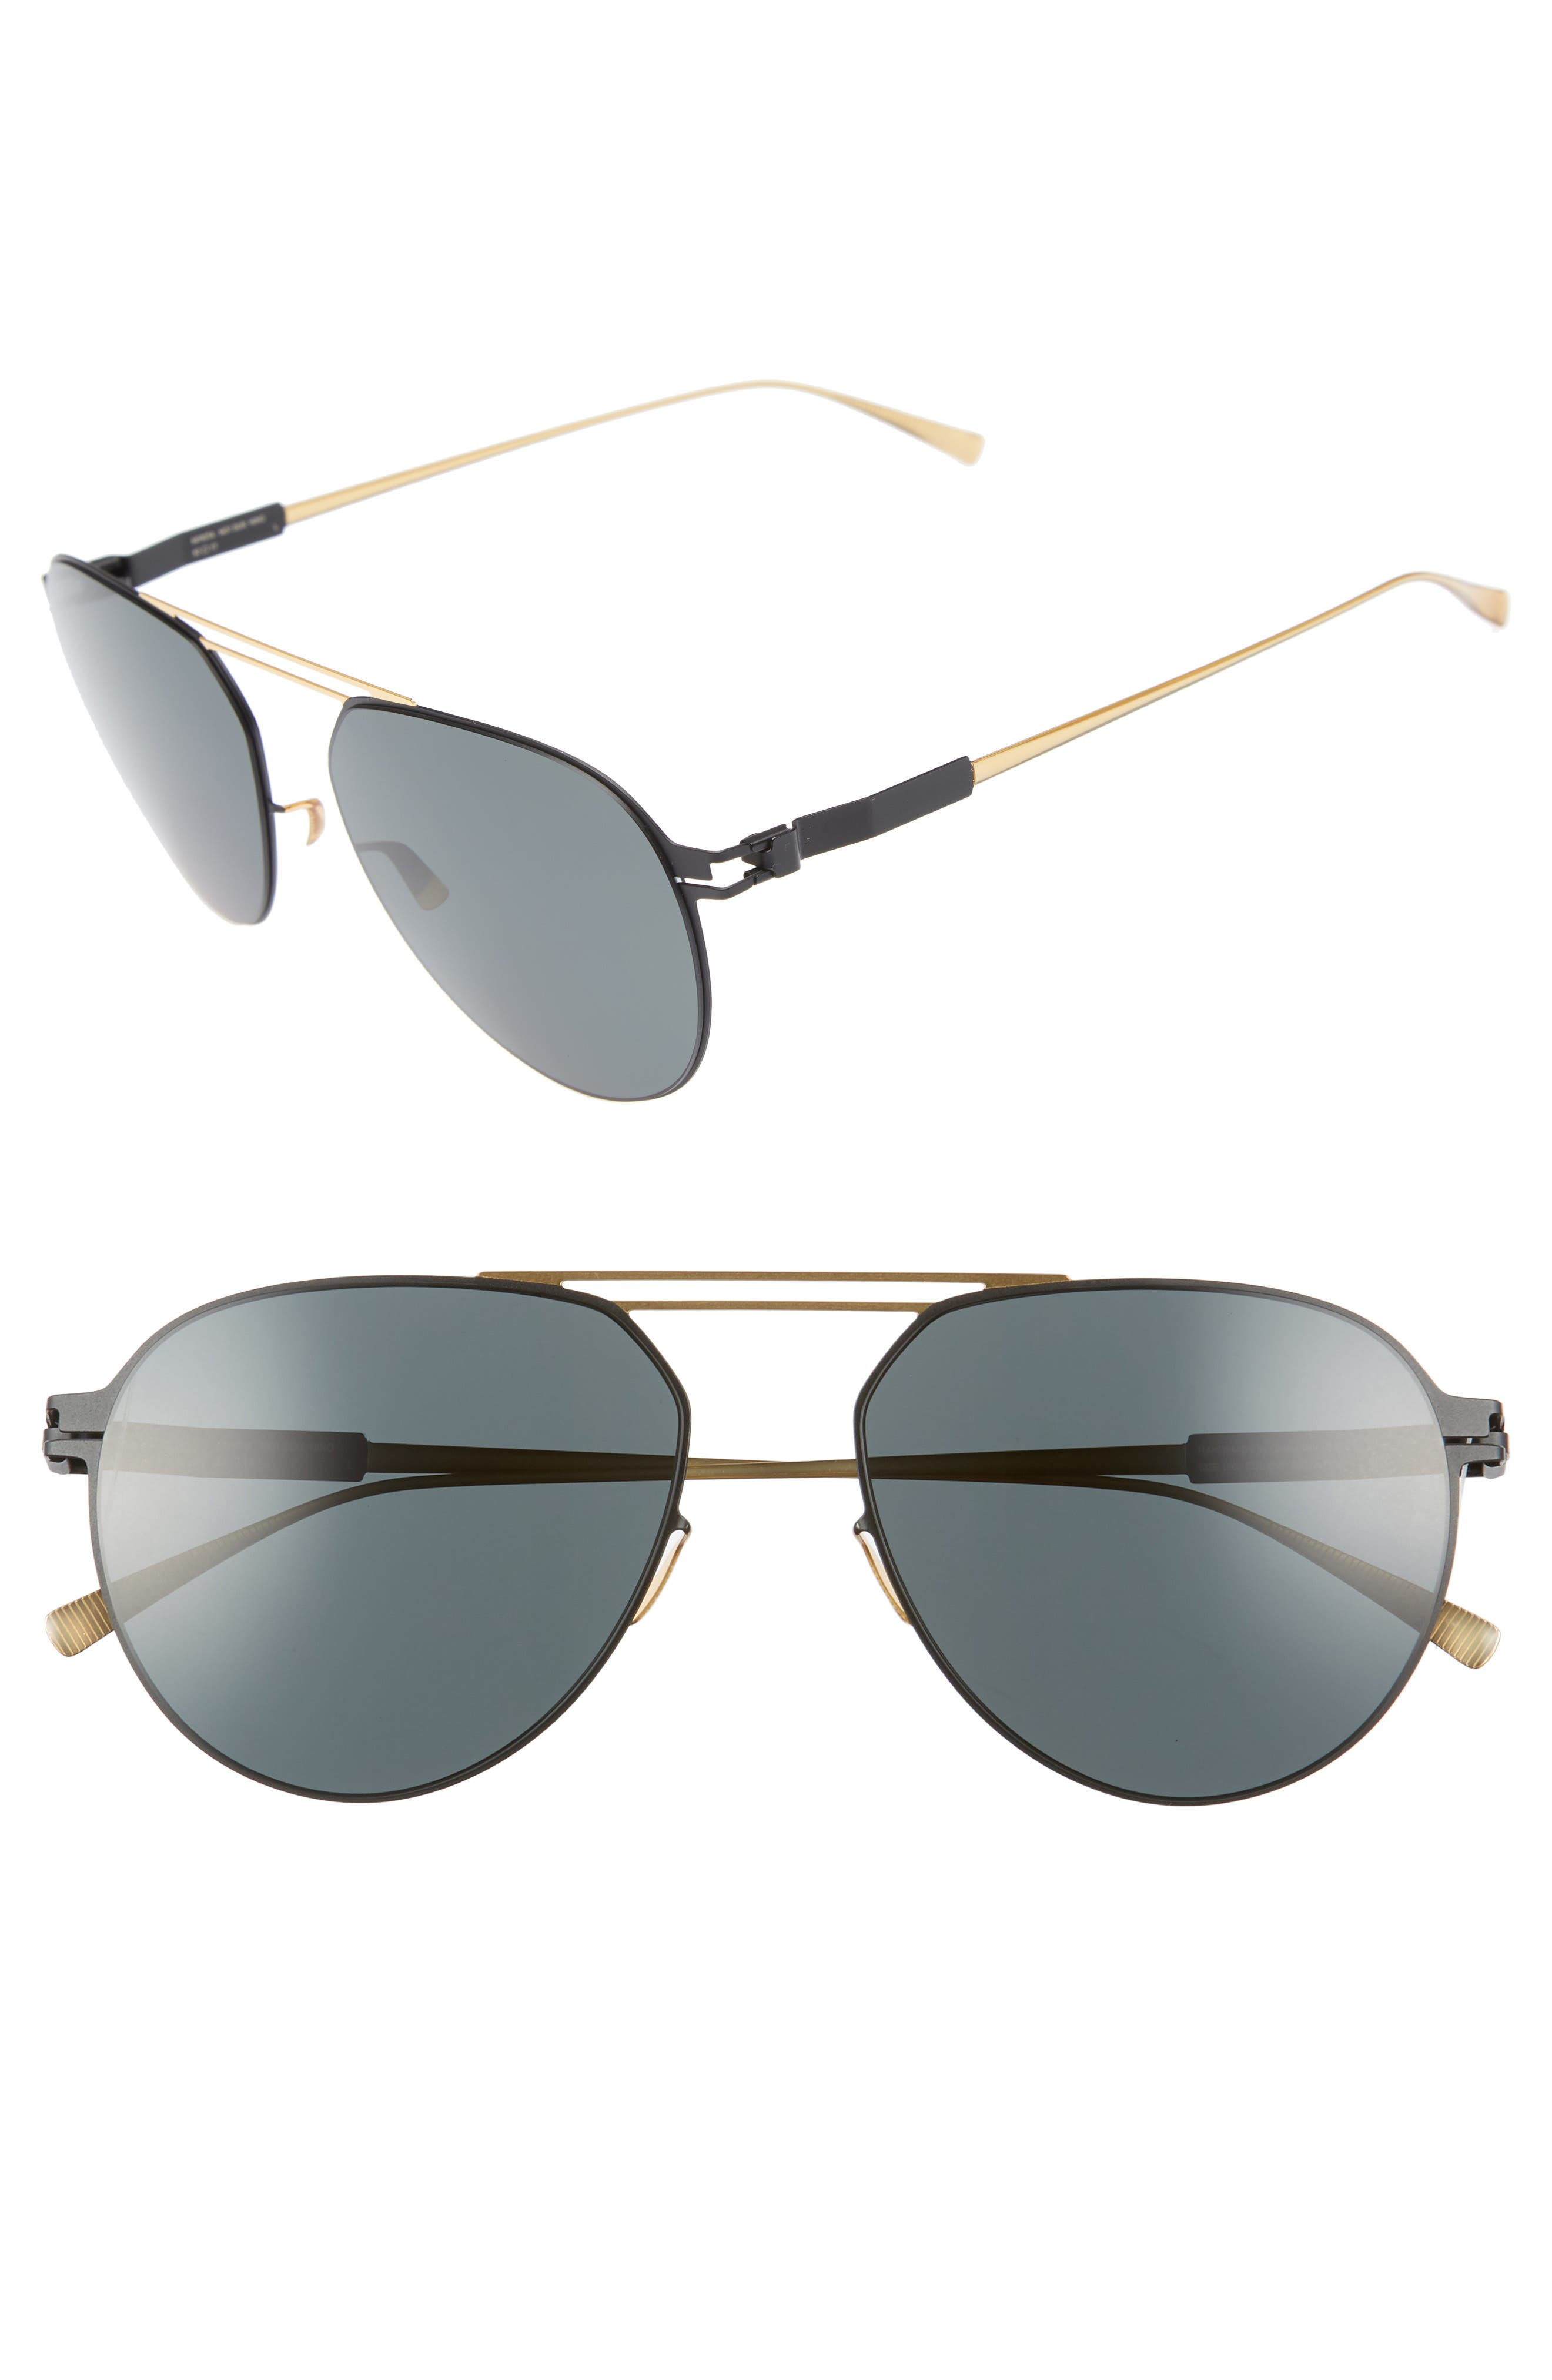 Nino 57mm Polarized Aviator Sunglasses,                         Main,                         color, 226